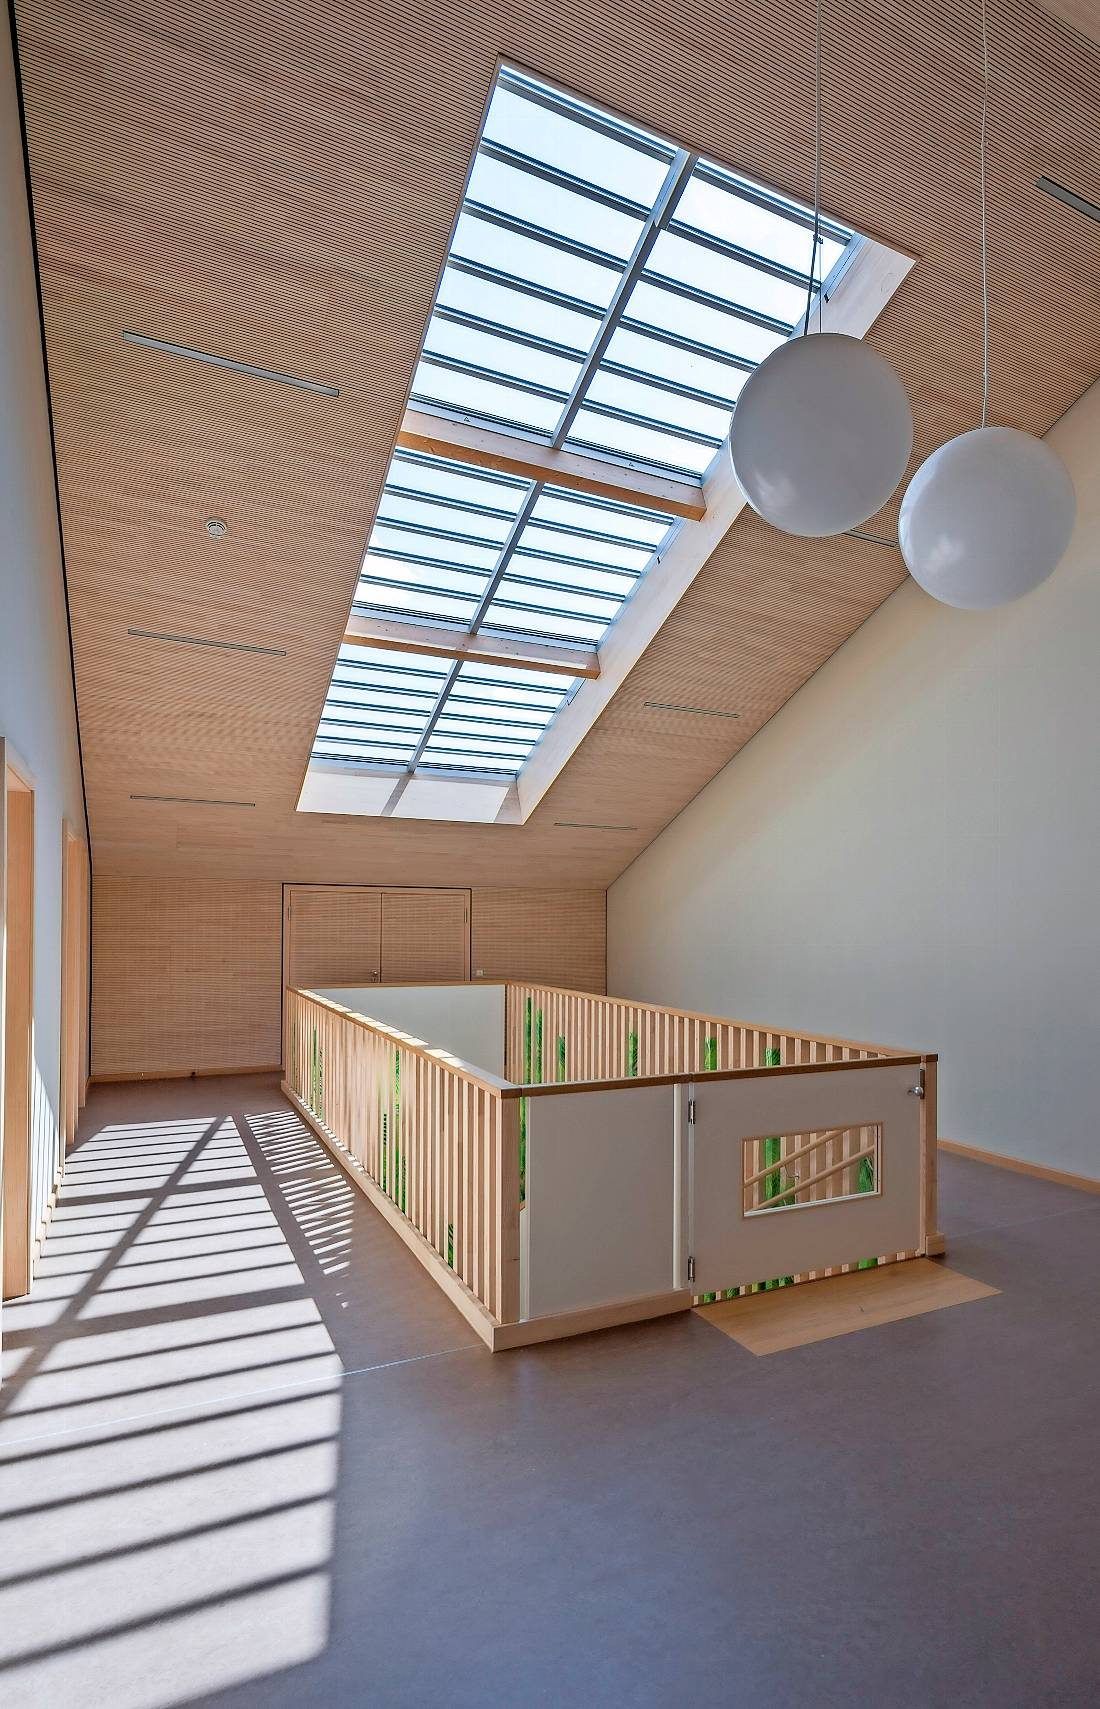 Moderner Holzbau tickt anders   Treffpunkt Kommune